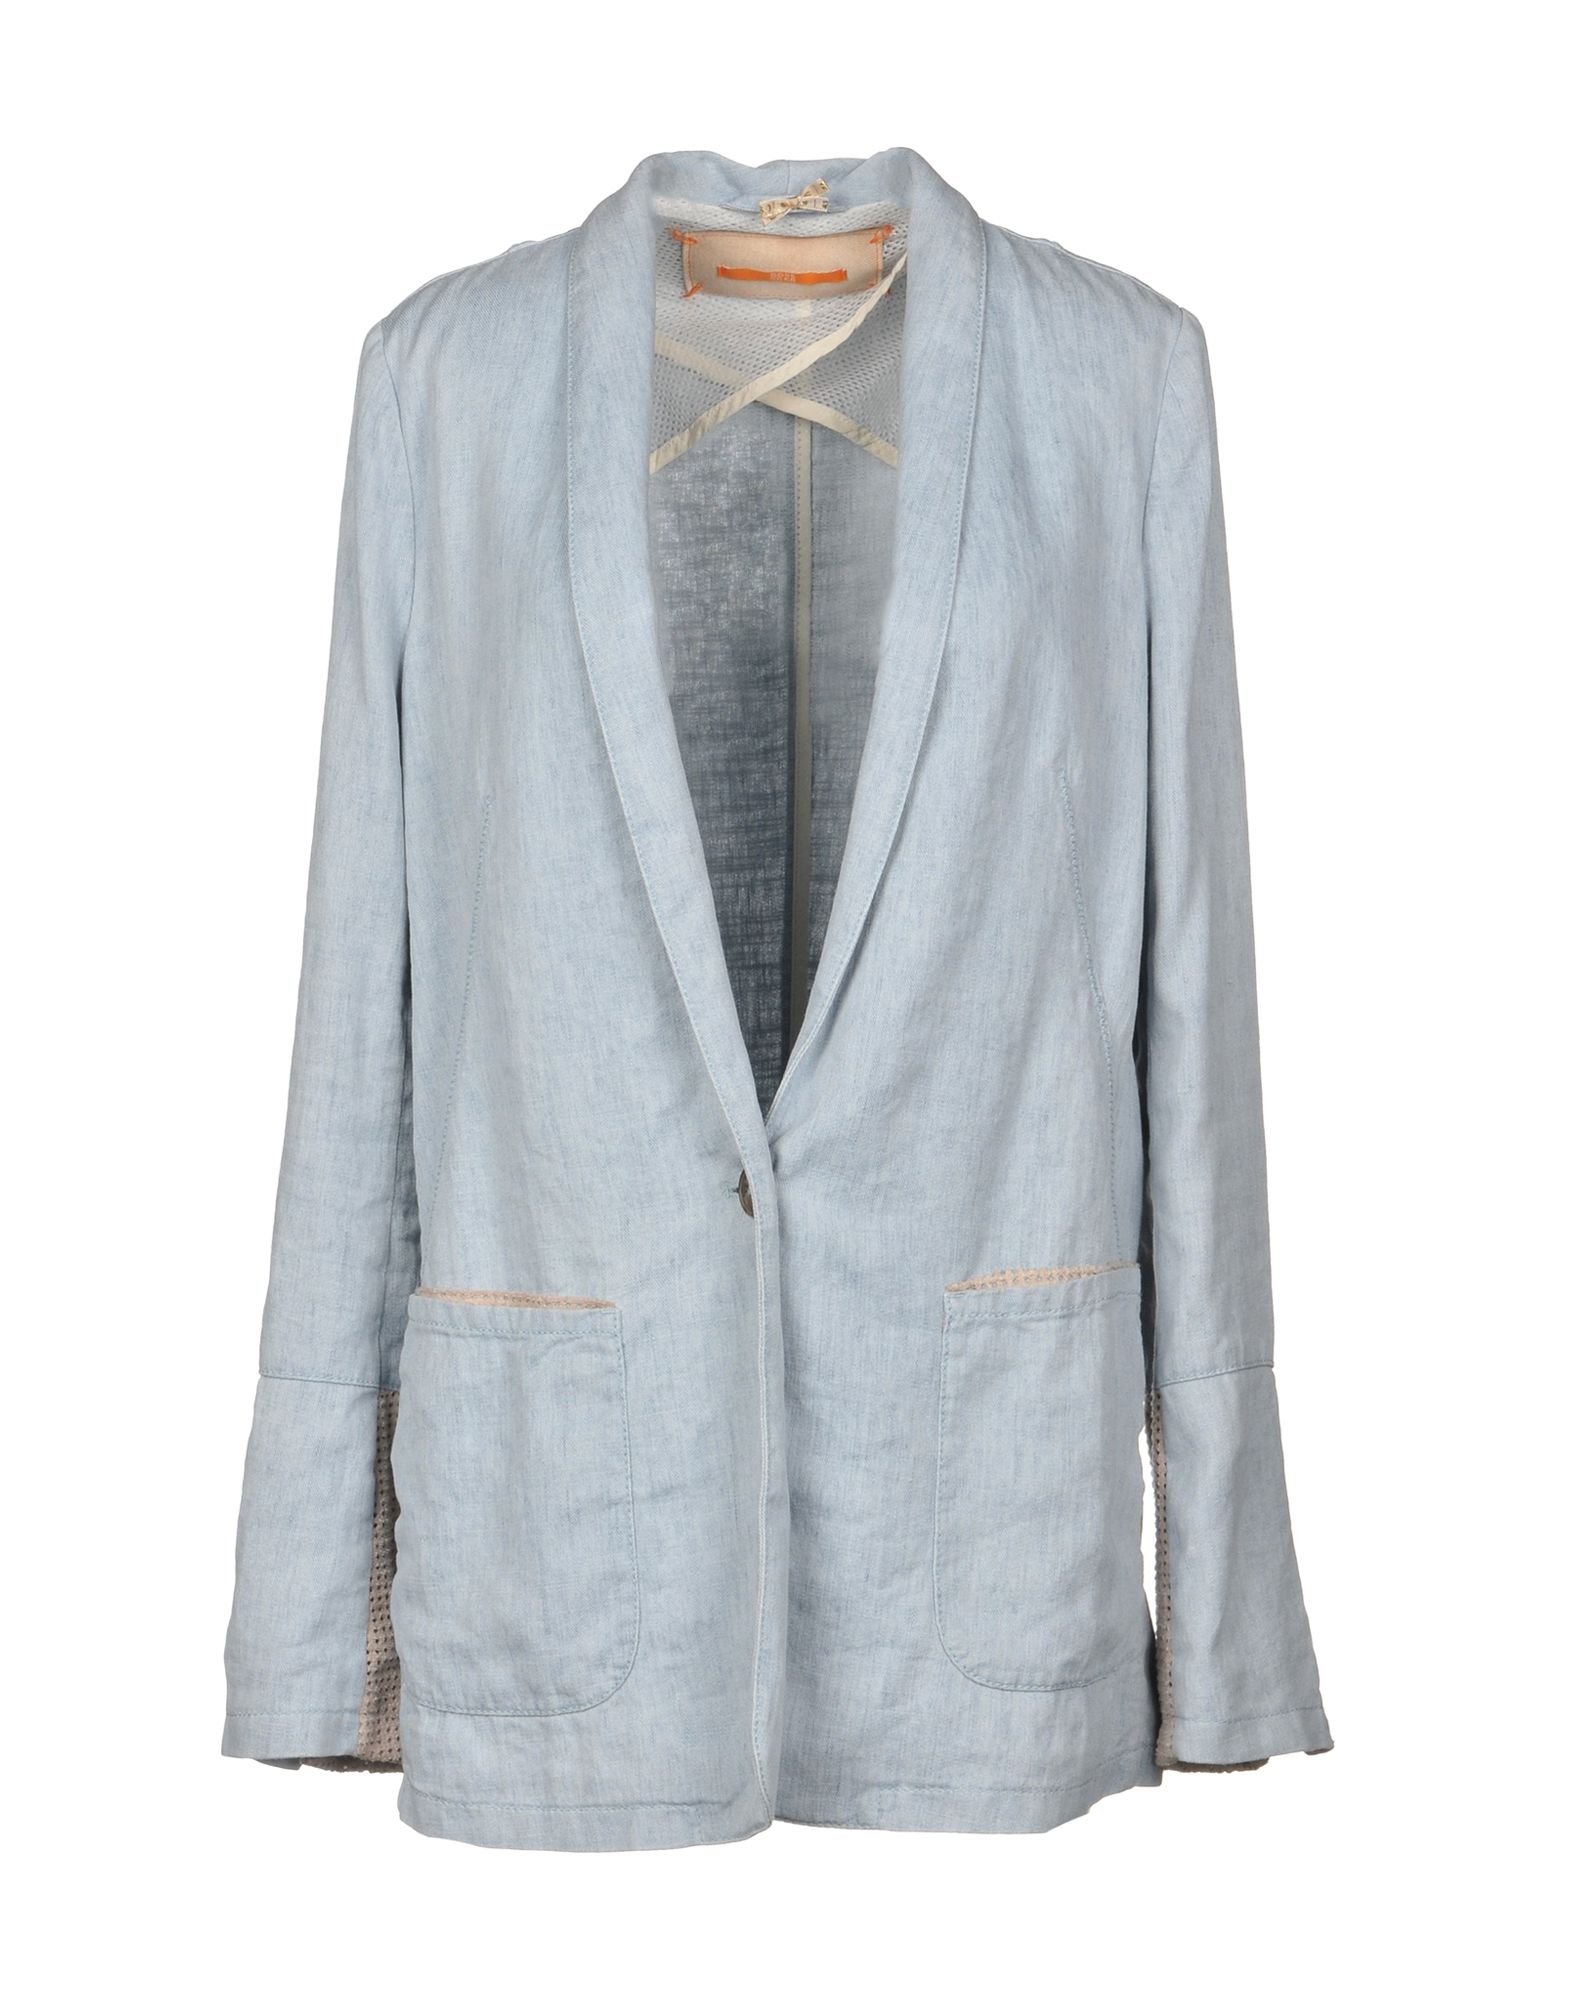 BOSS Orange - Κορυφαία προϊόντα για ολοκληρωμένα Outfit  b0166d71b86